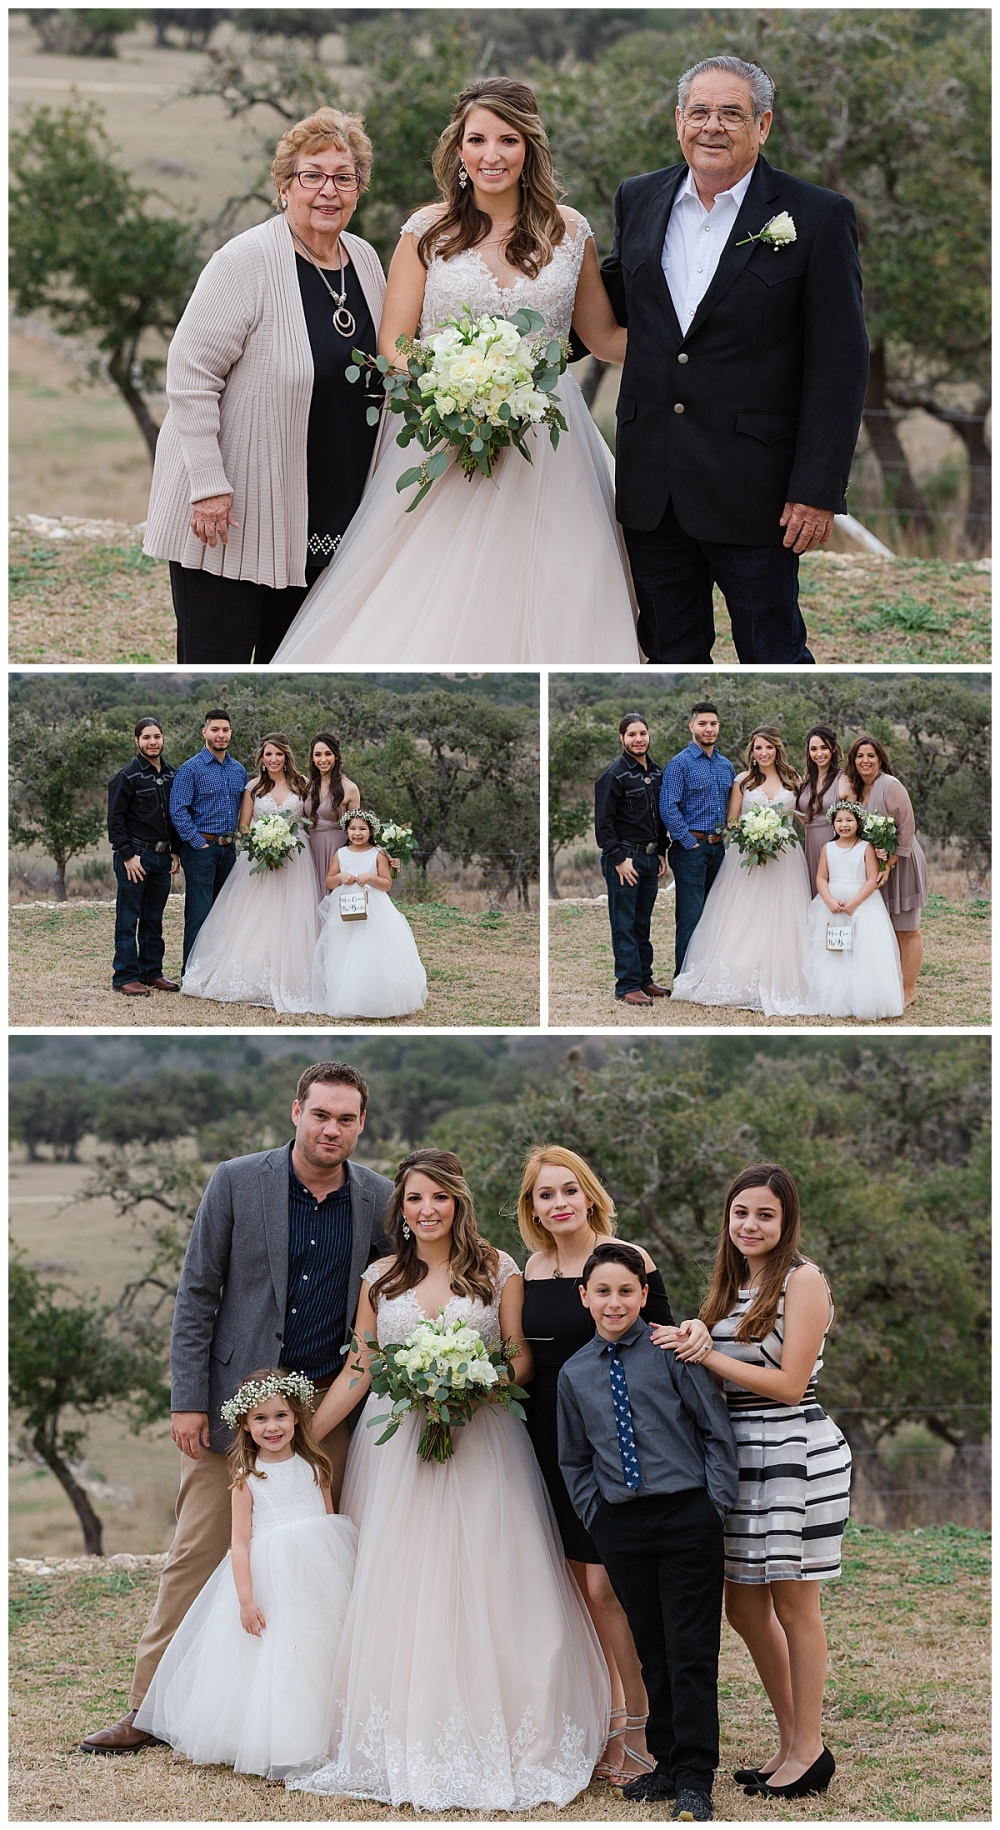 Wedding-Photographer-Texas-Hill-Country-Happy-H-Ranch-Comfor-Texas-Carly-Barton-Photography_0036.jpg